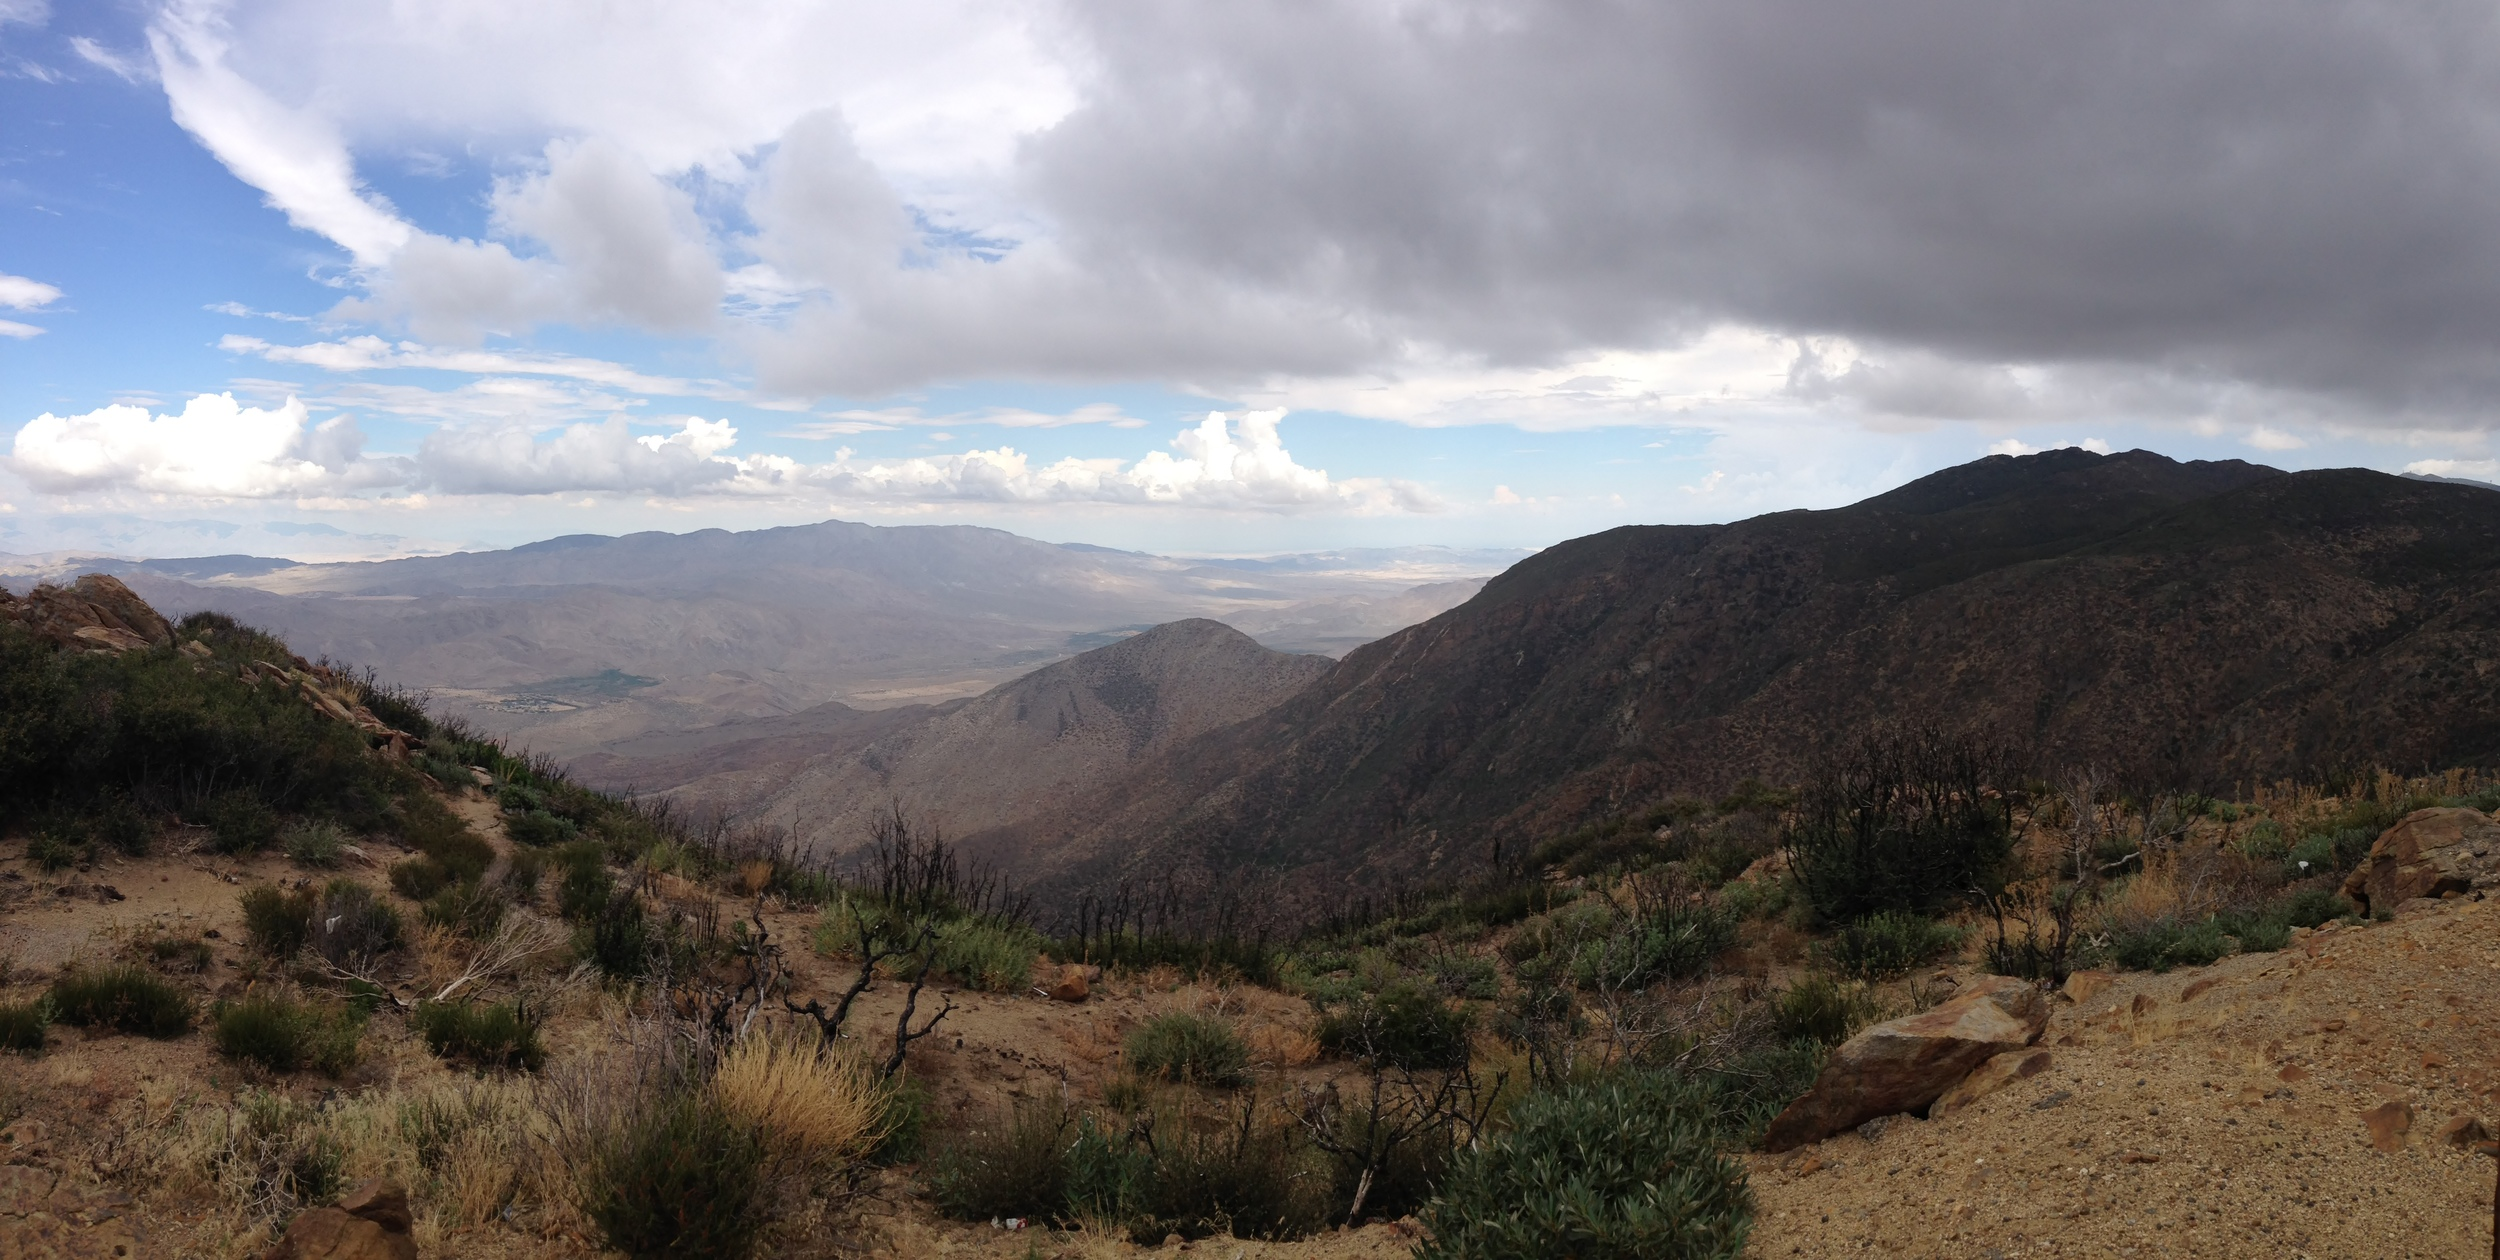 Kwaaymaii Point, facing east toward the Anza-Borrego Desert.